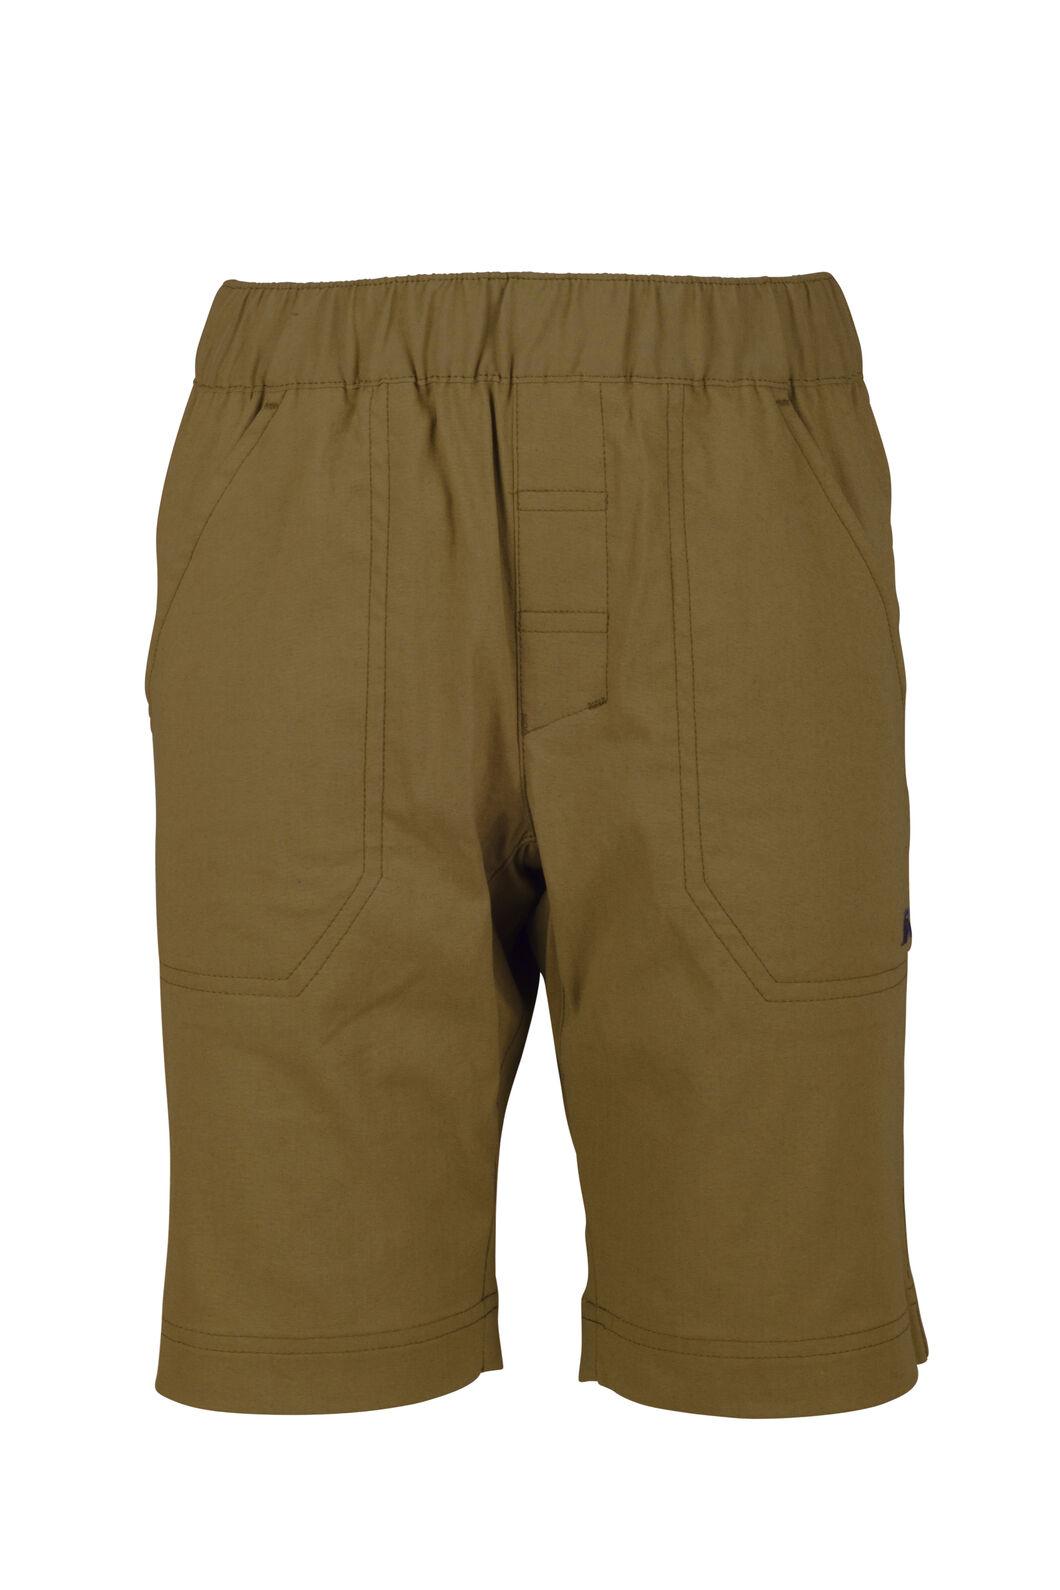 Macpac Piha Shorts - Kids', Breen, hi-res